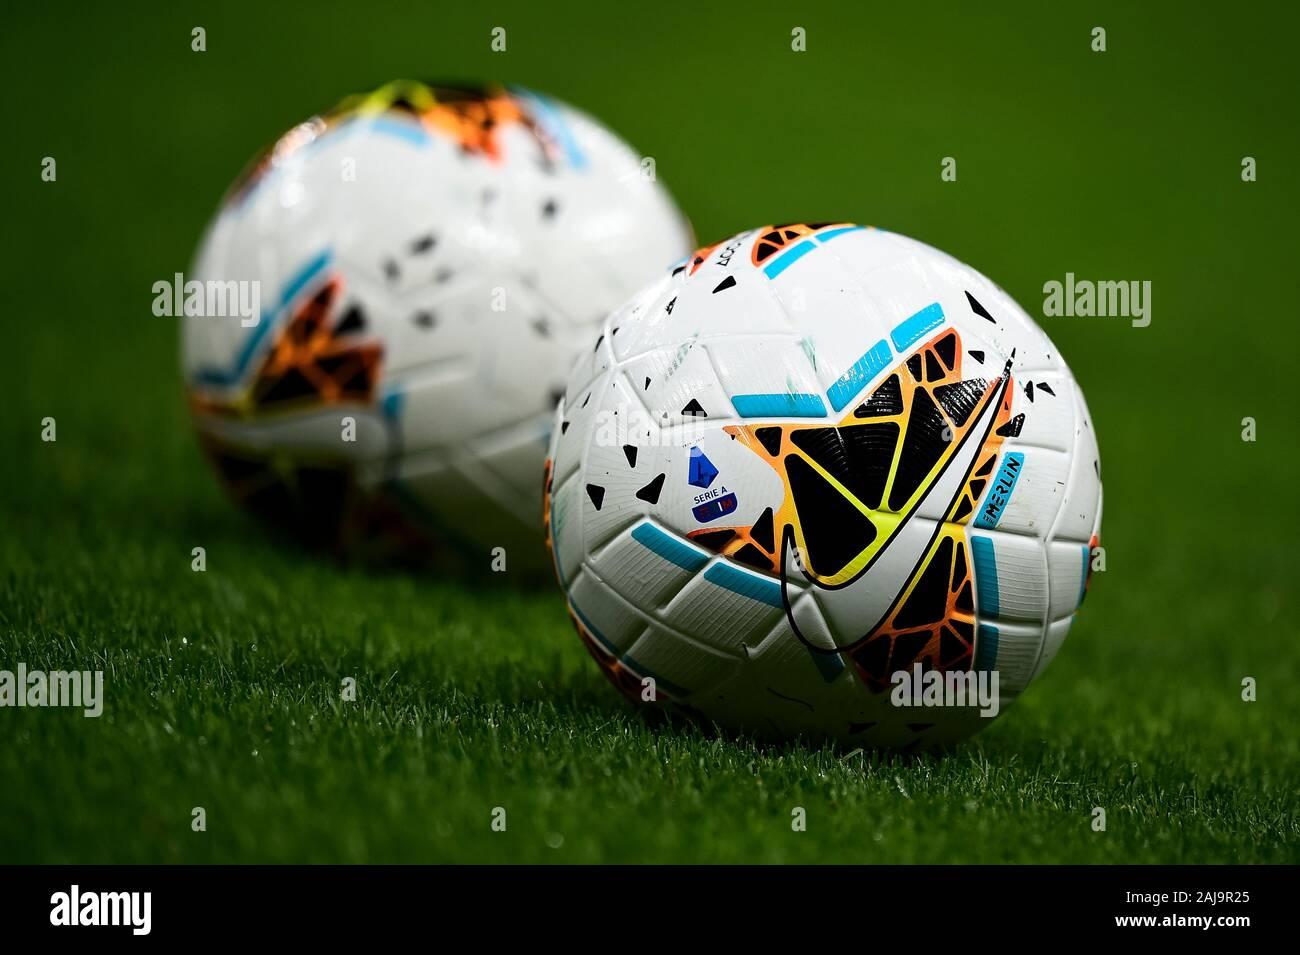 Lugar de nacimiento Préstamo de dinero Nombrar  Nike Merlin Football High Resolution Stock Photography and Images - Alamy